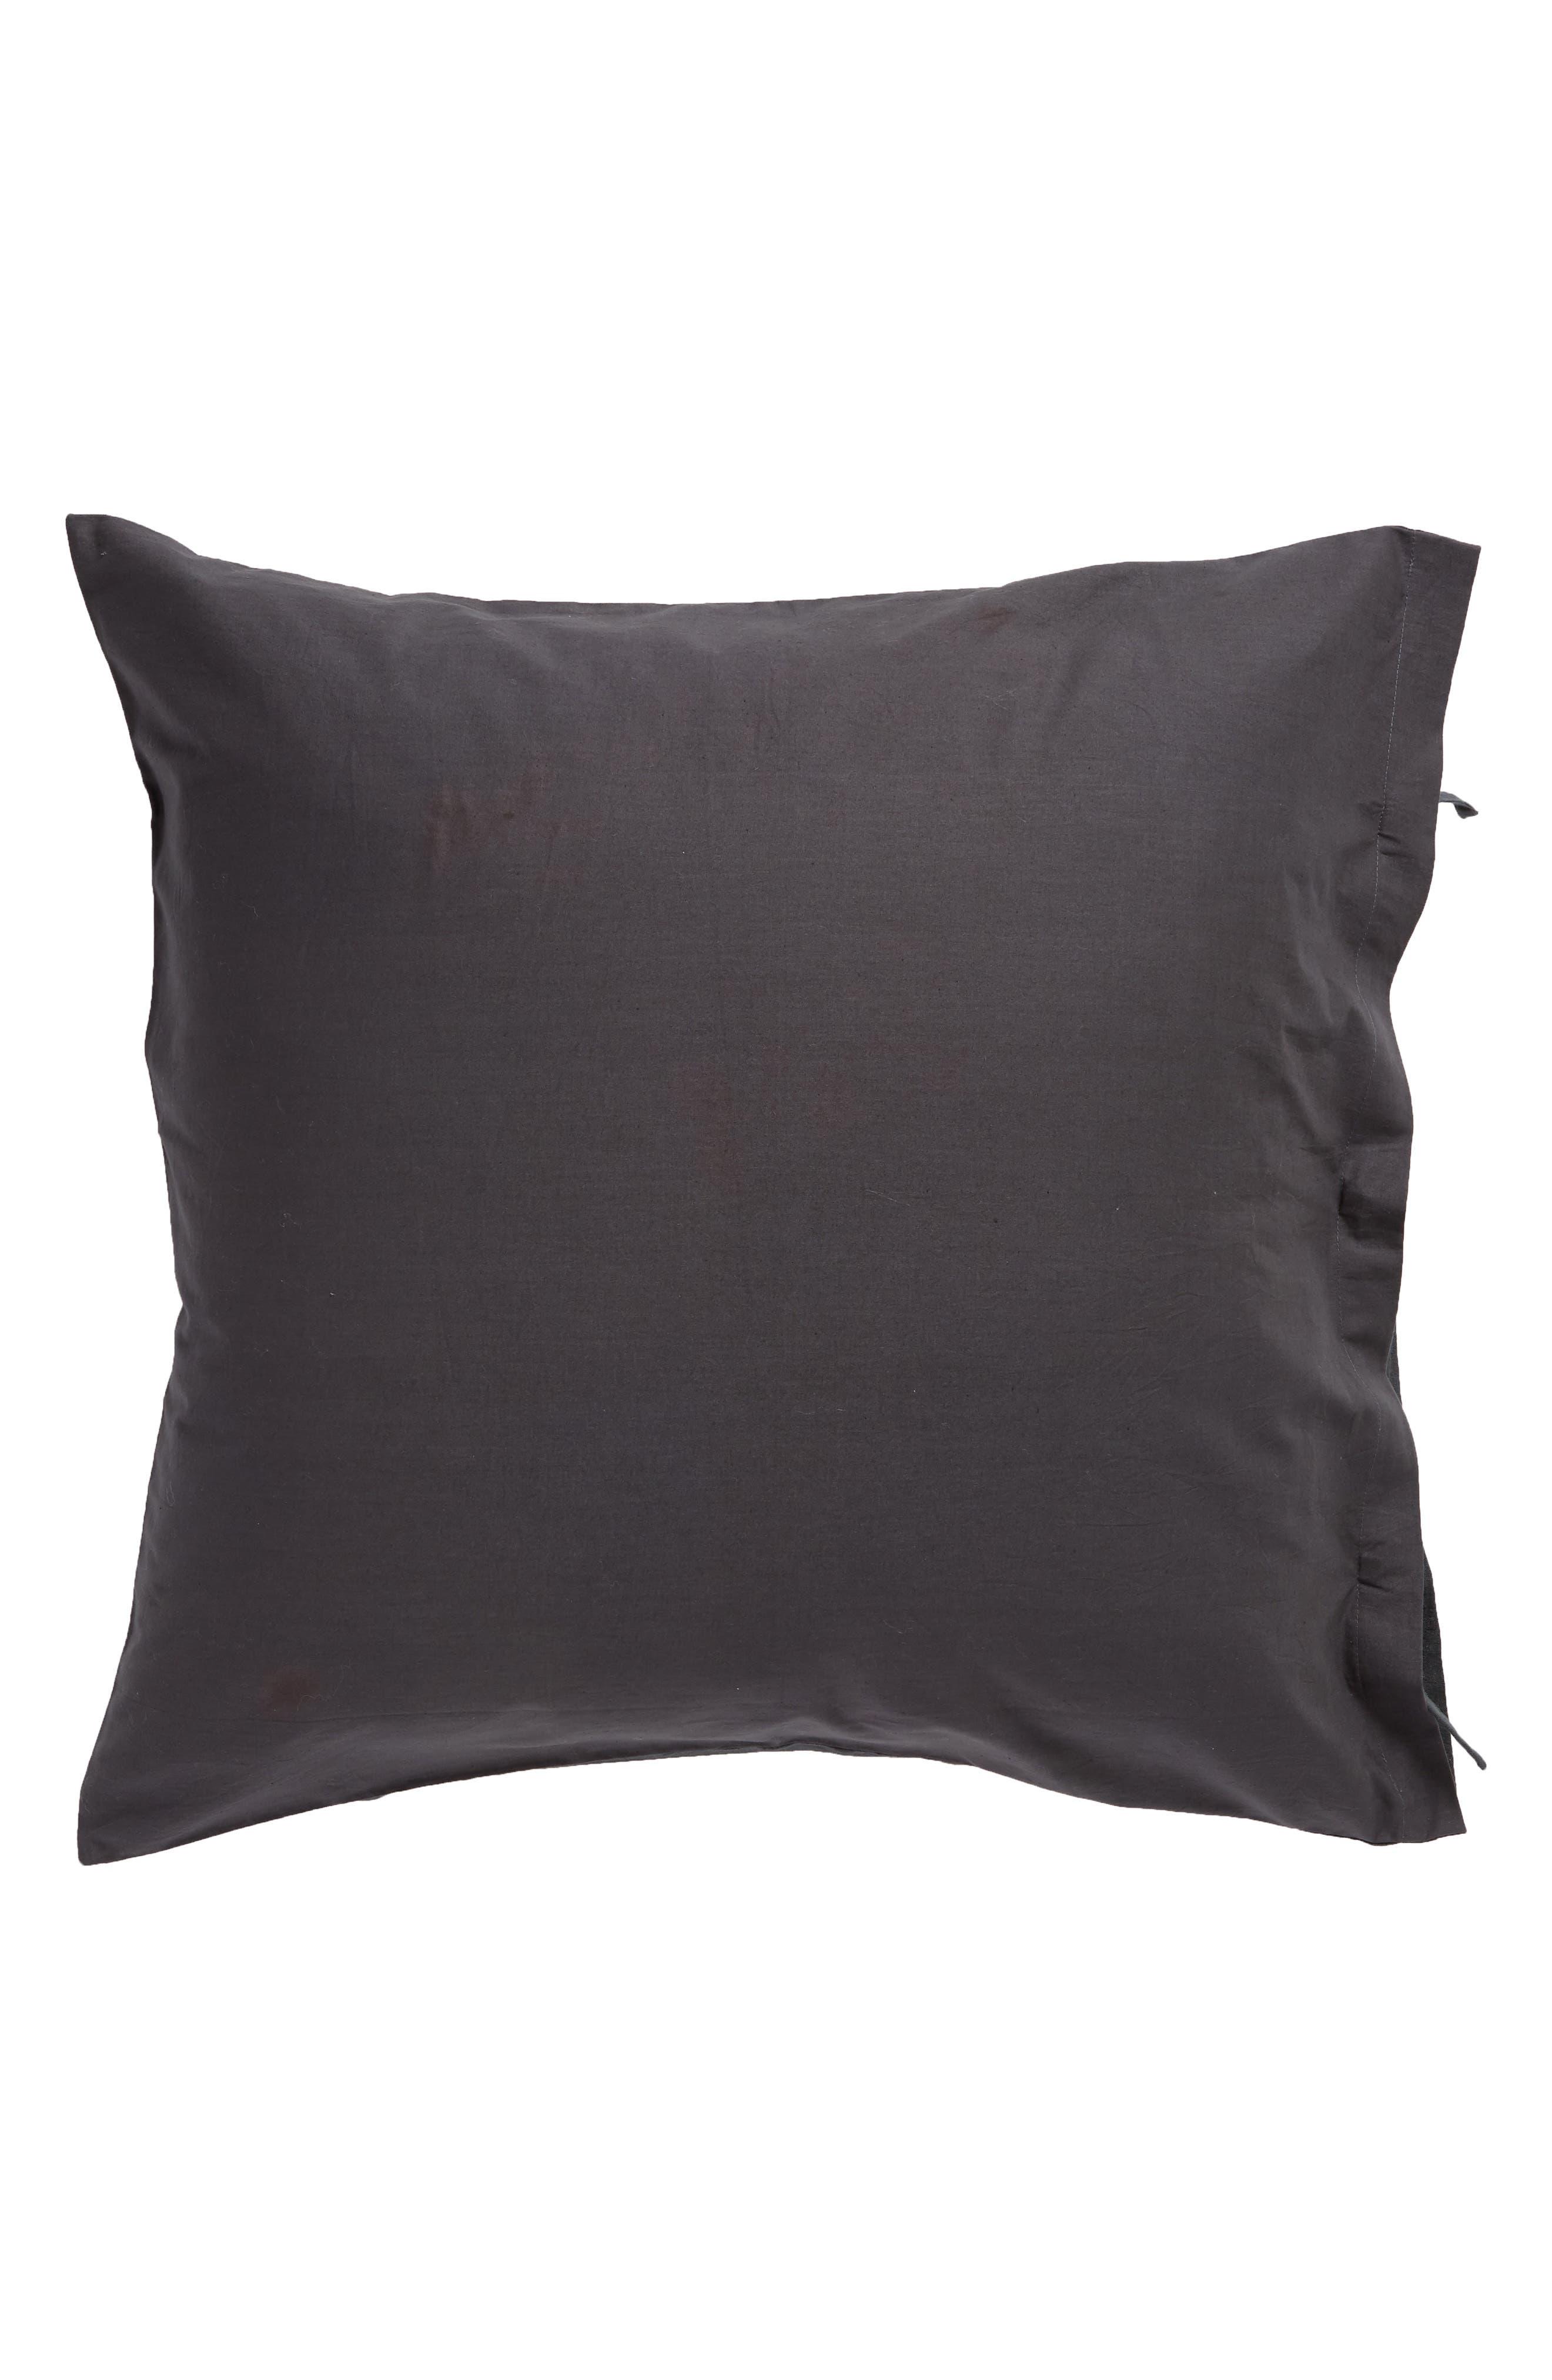 TREASURE & BOND, Relaxed Cotton & Linen Euro Sham, Alternate thumbnail 2, color, GREY ONYX